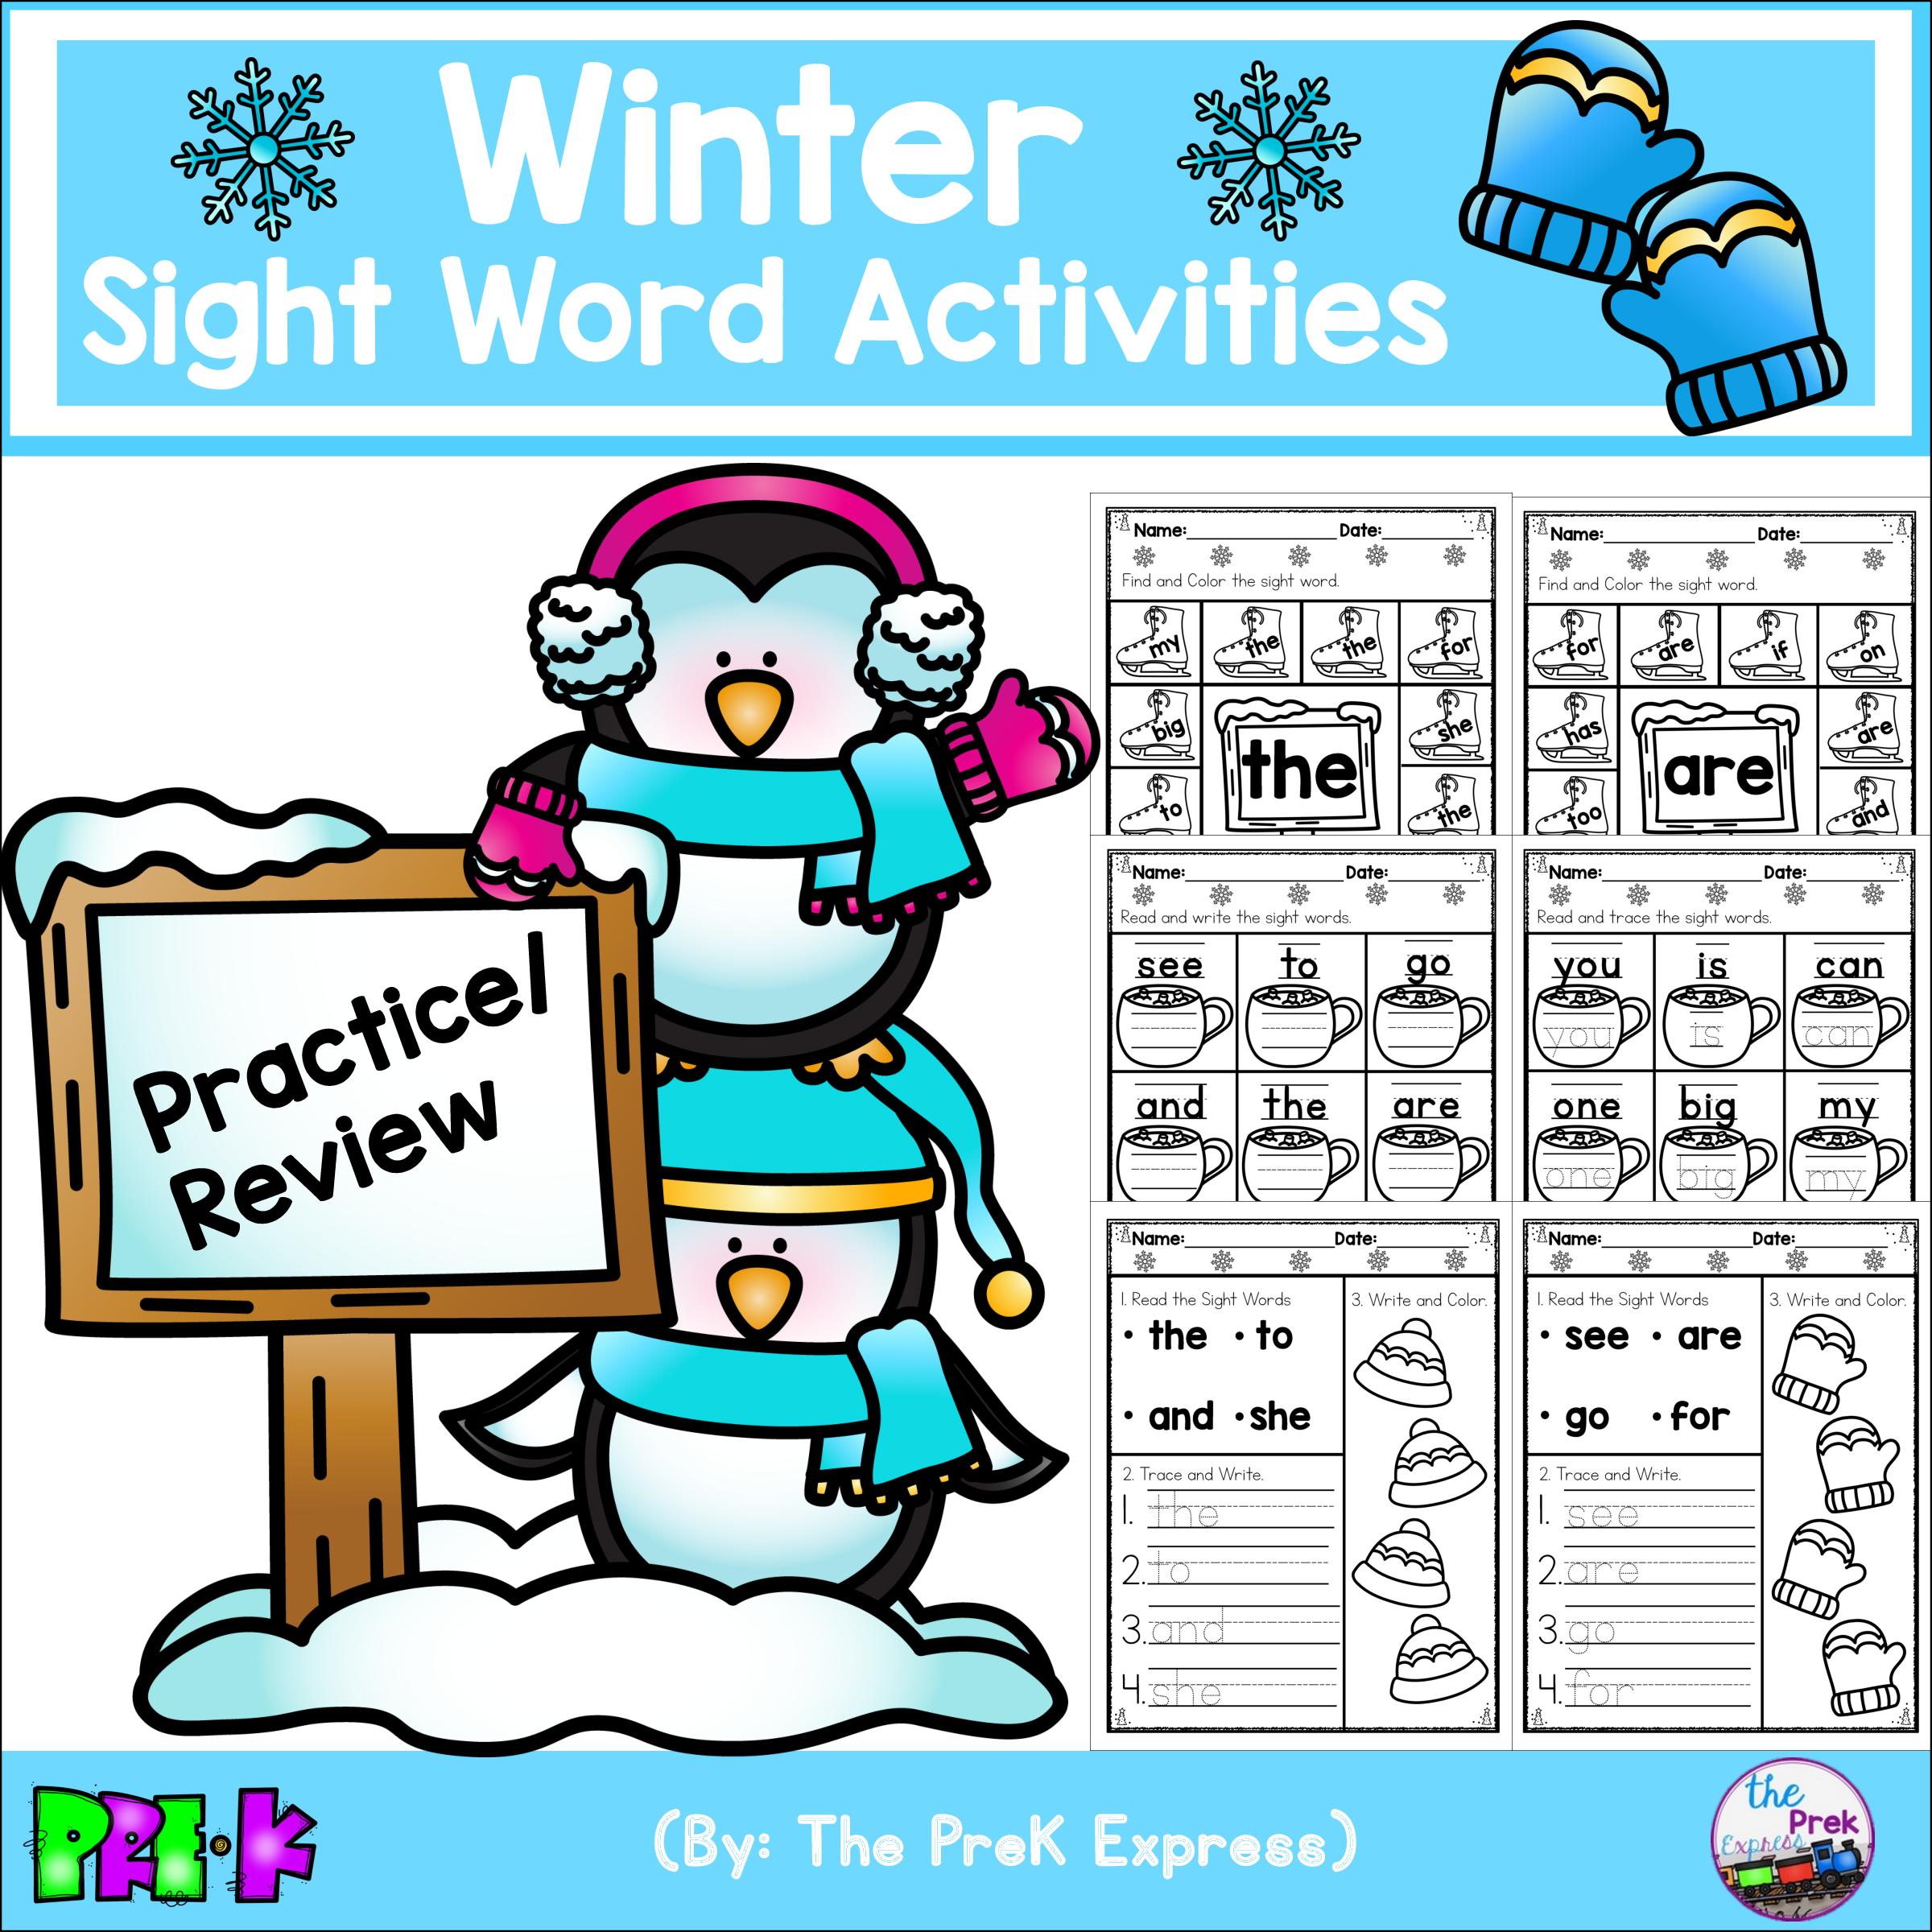 Winter Sight Word Activities